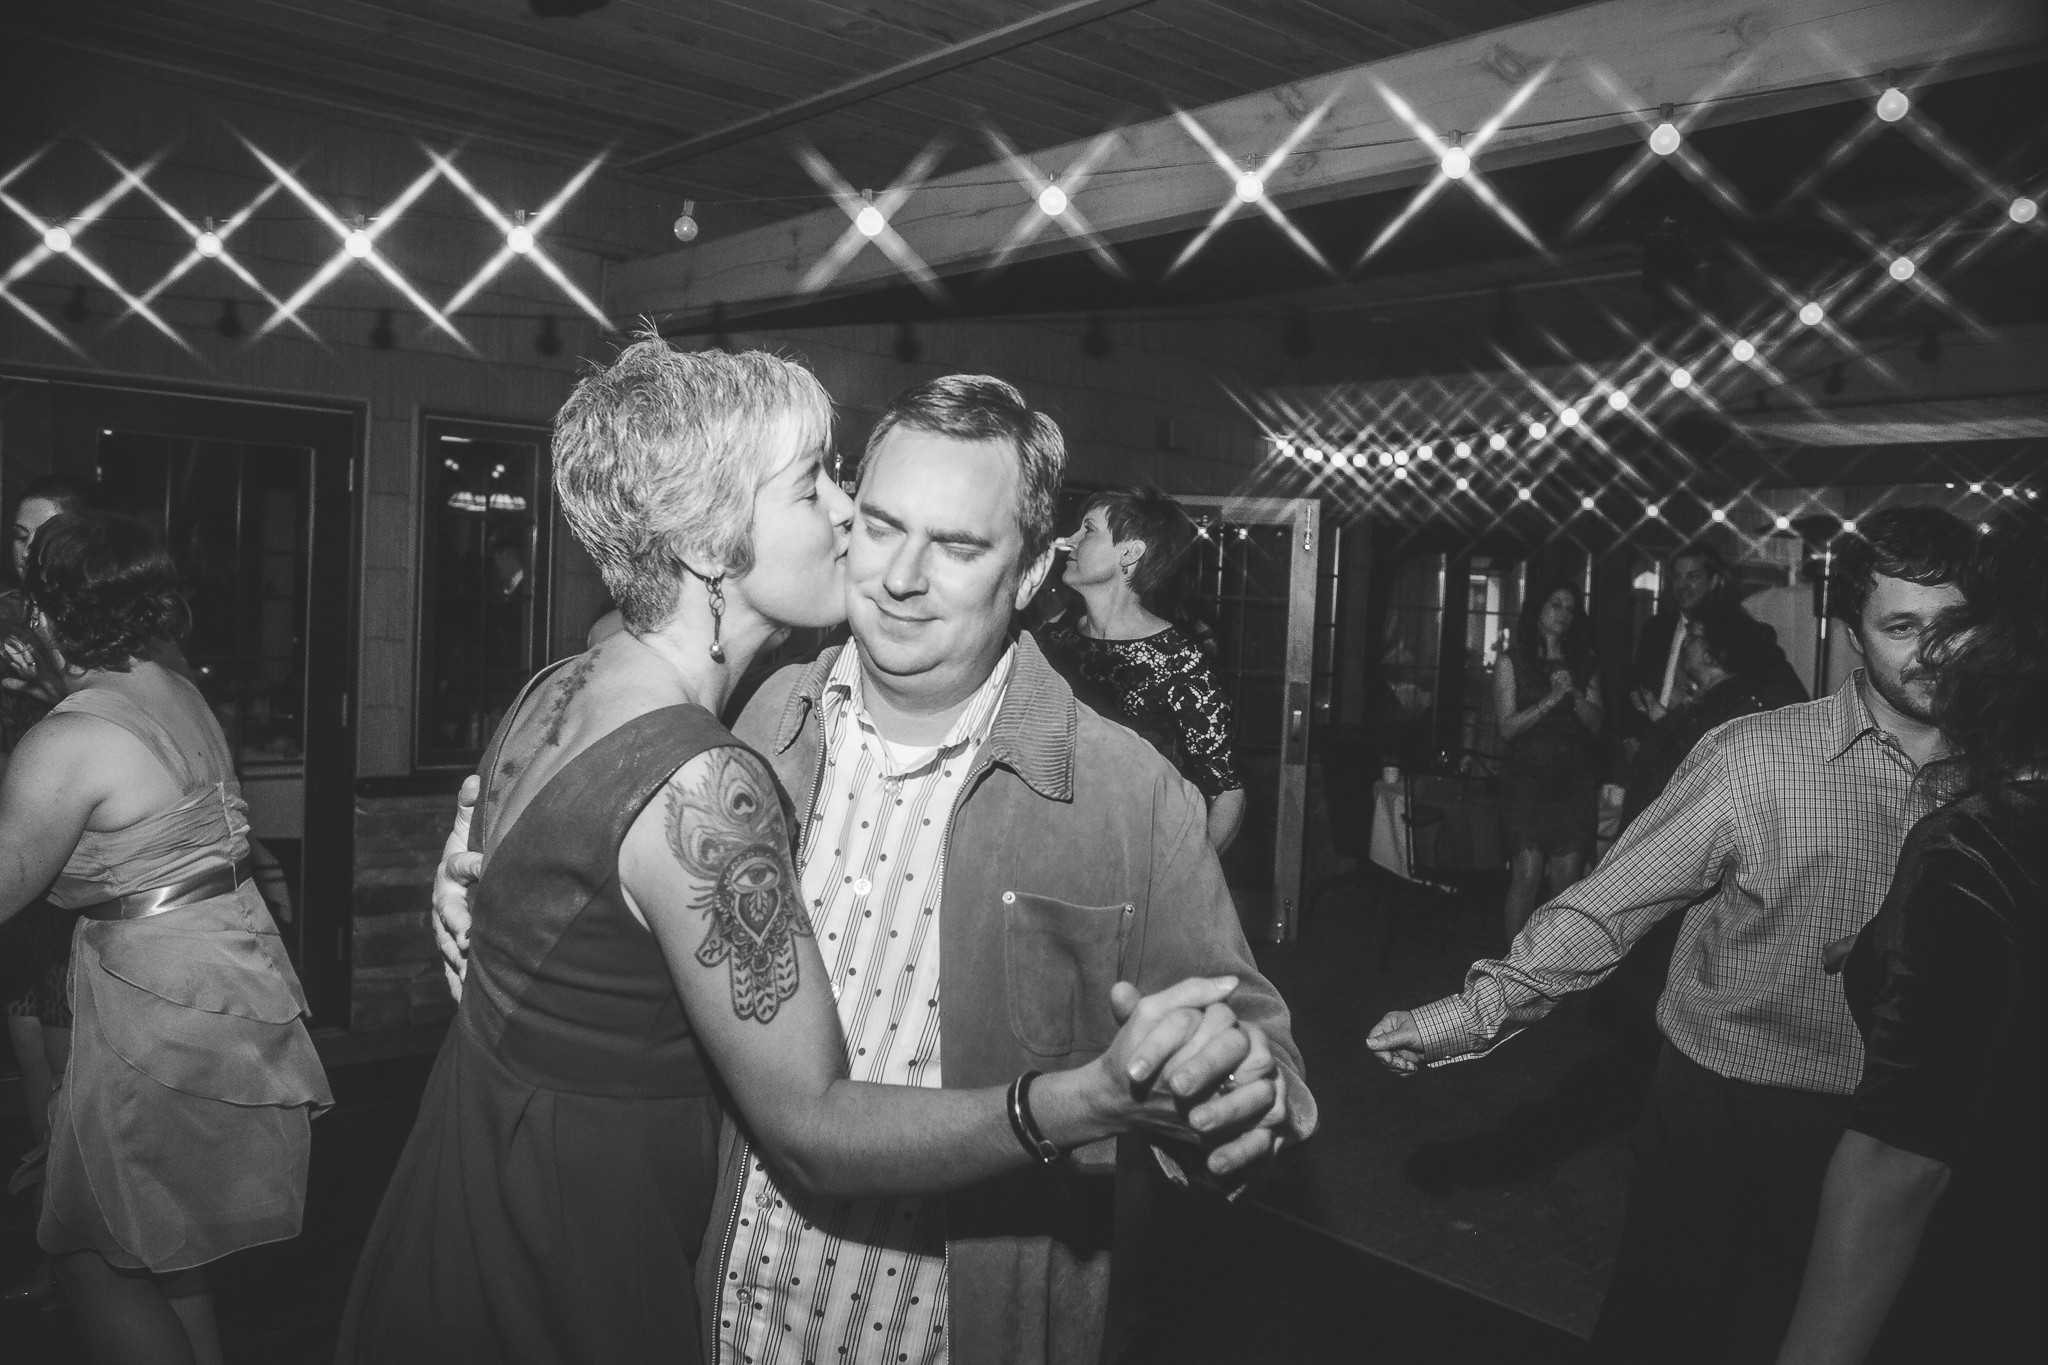 camuglia-whomstudio-chelsea_and_andy-nycphotographer-wedding-brooklyn-buffalo-timberlodge-164-5723.jpg